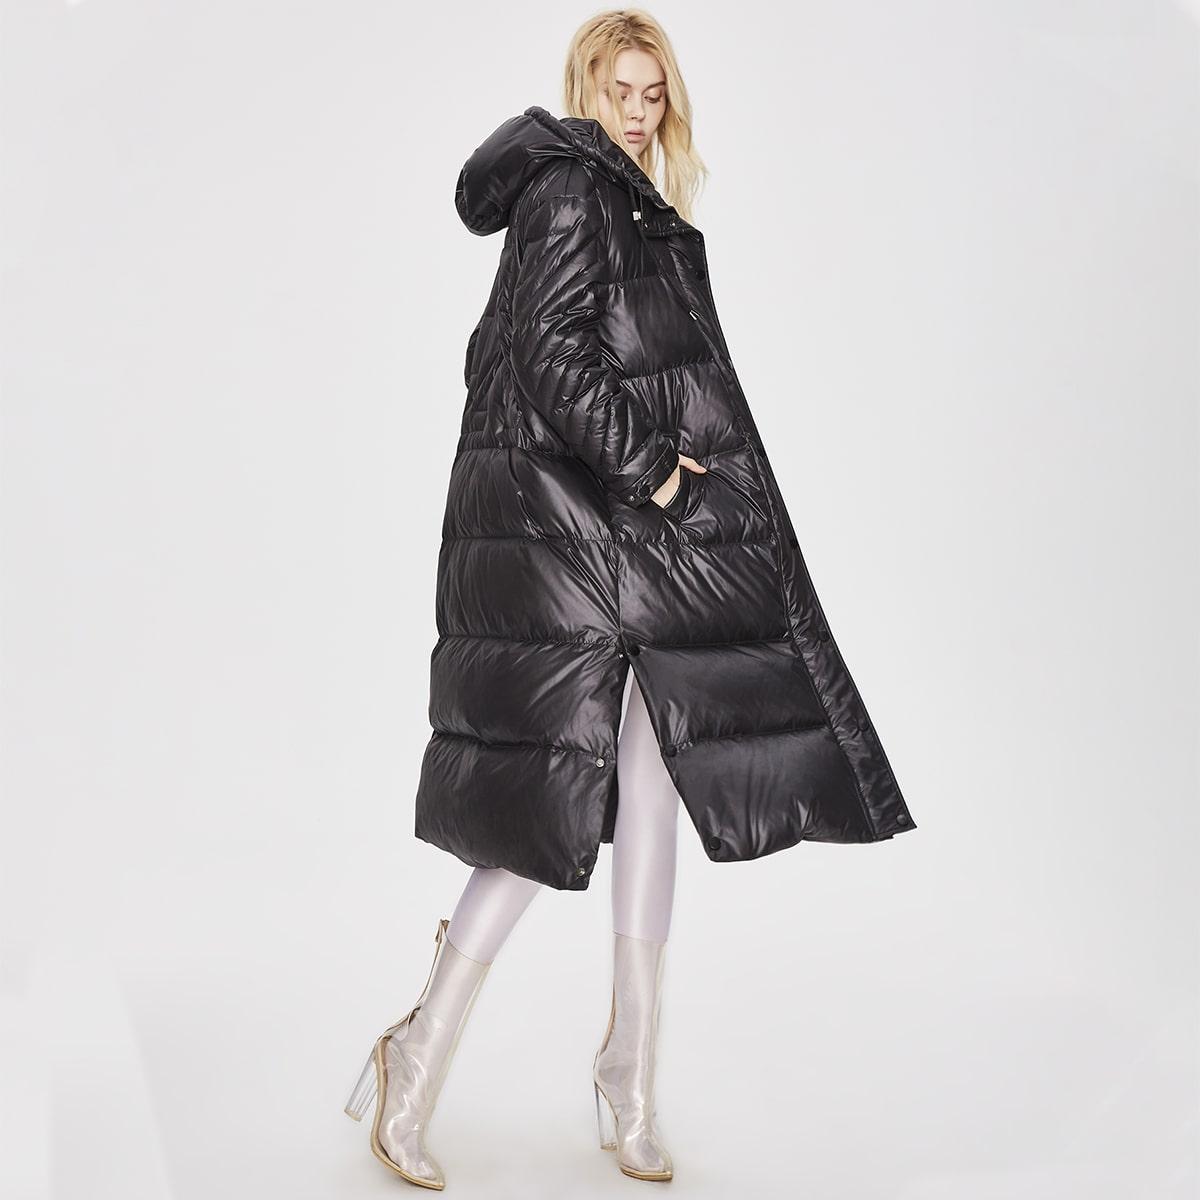 Zip Up Hooded Pocket Side Down Coat